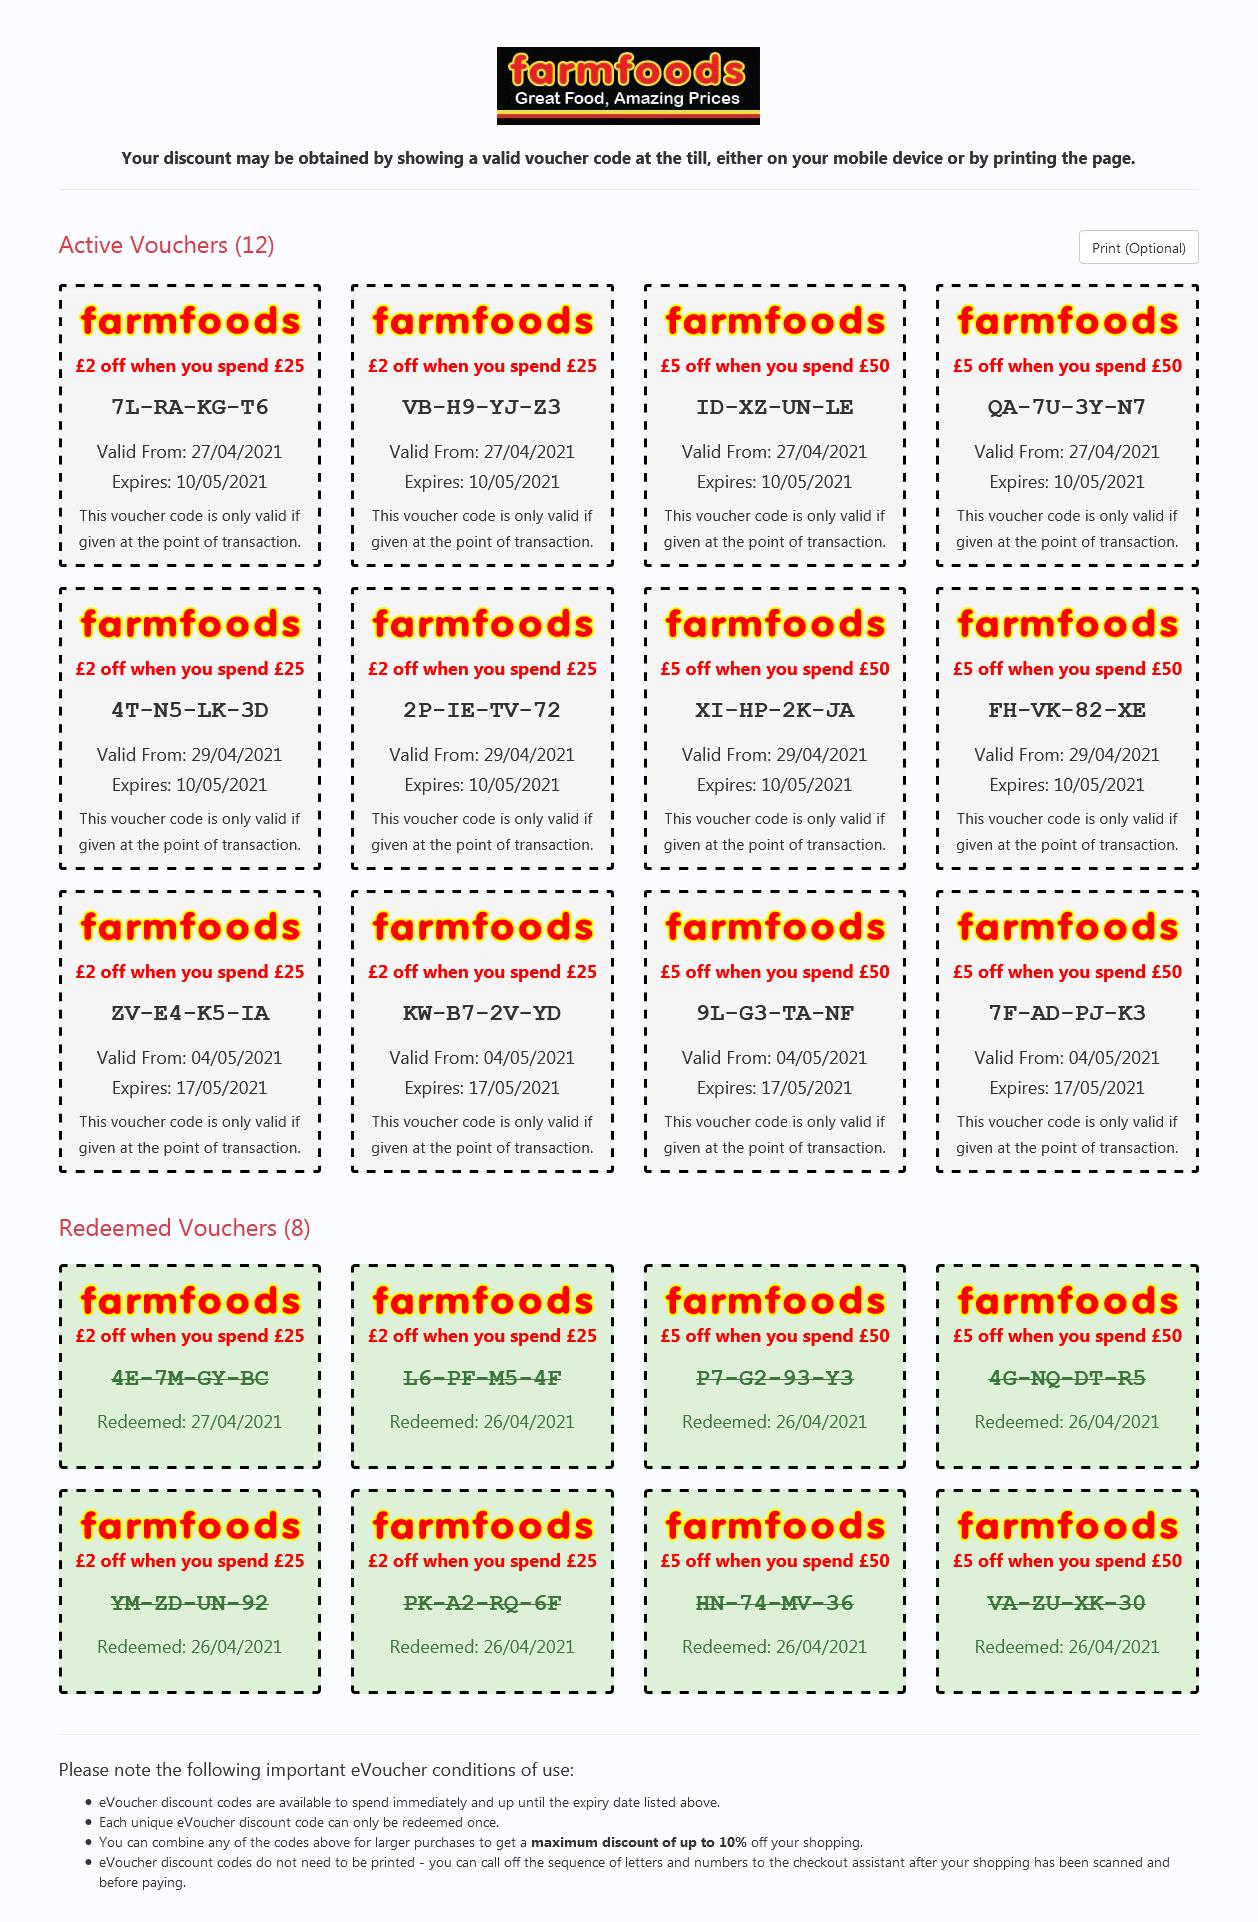 Farmfoods Vouchers this week valid until 17/5/2021